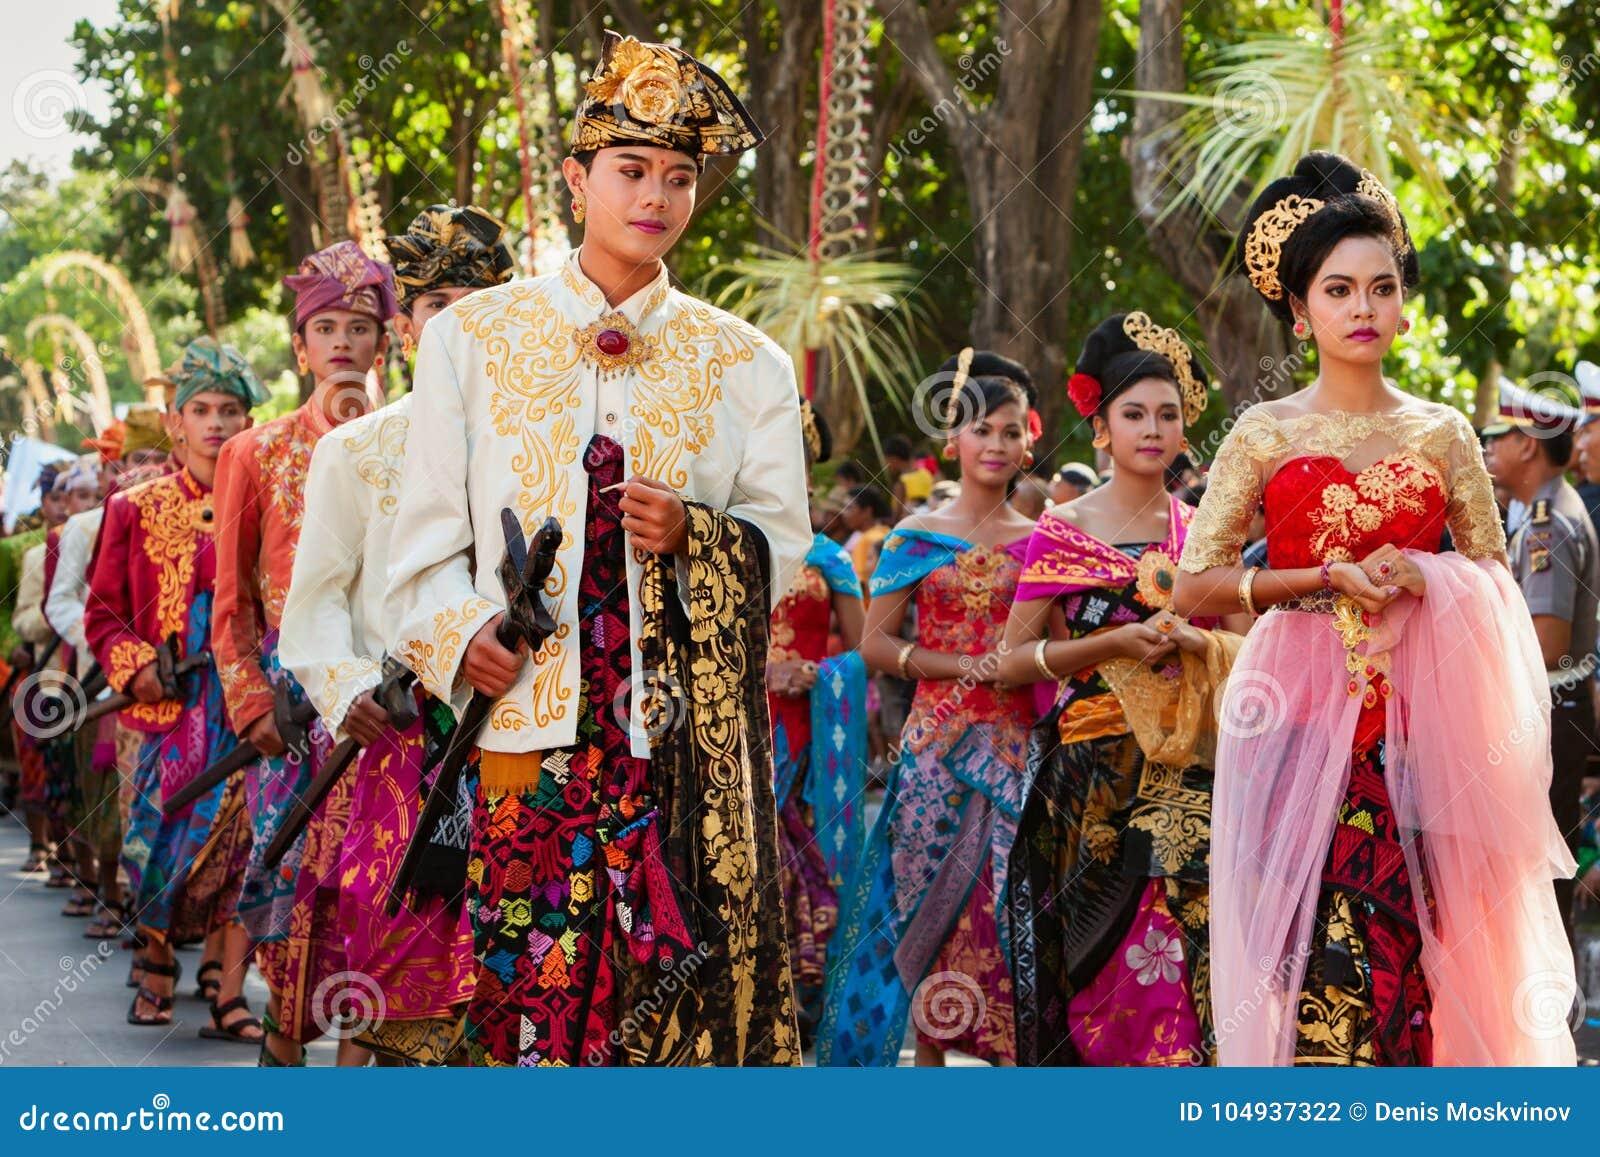 Denpasar indonesia women seeking men